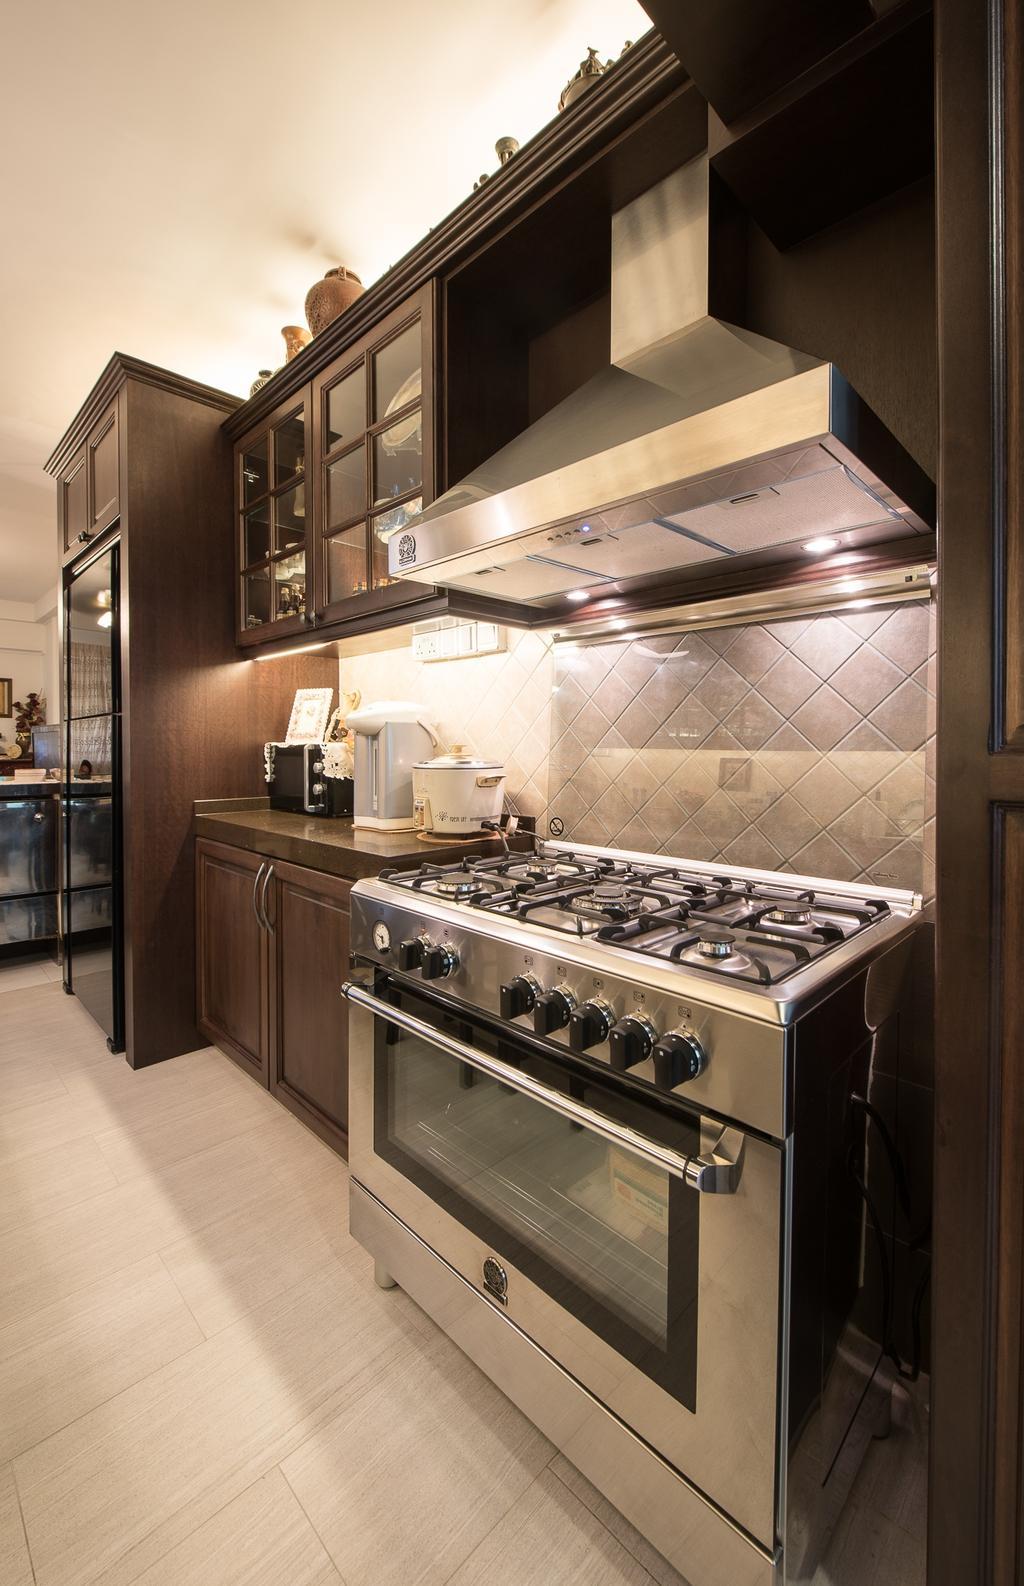 Traditional, HDB, Kitchen, Woodlands Street 41 (Block 418), Interior Designer, Fatema Design Studio, Tiles, Stove, Hood, Fridge, Cabinets, Appliance, Electrical Device, Oven, Bathroom, Indoors, Interior Design, Room